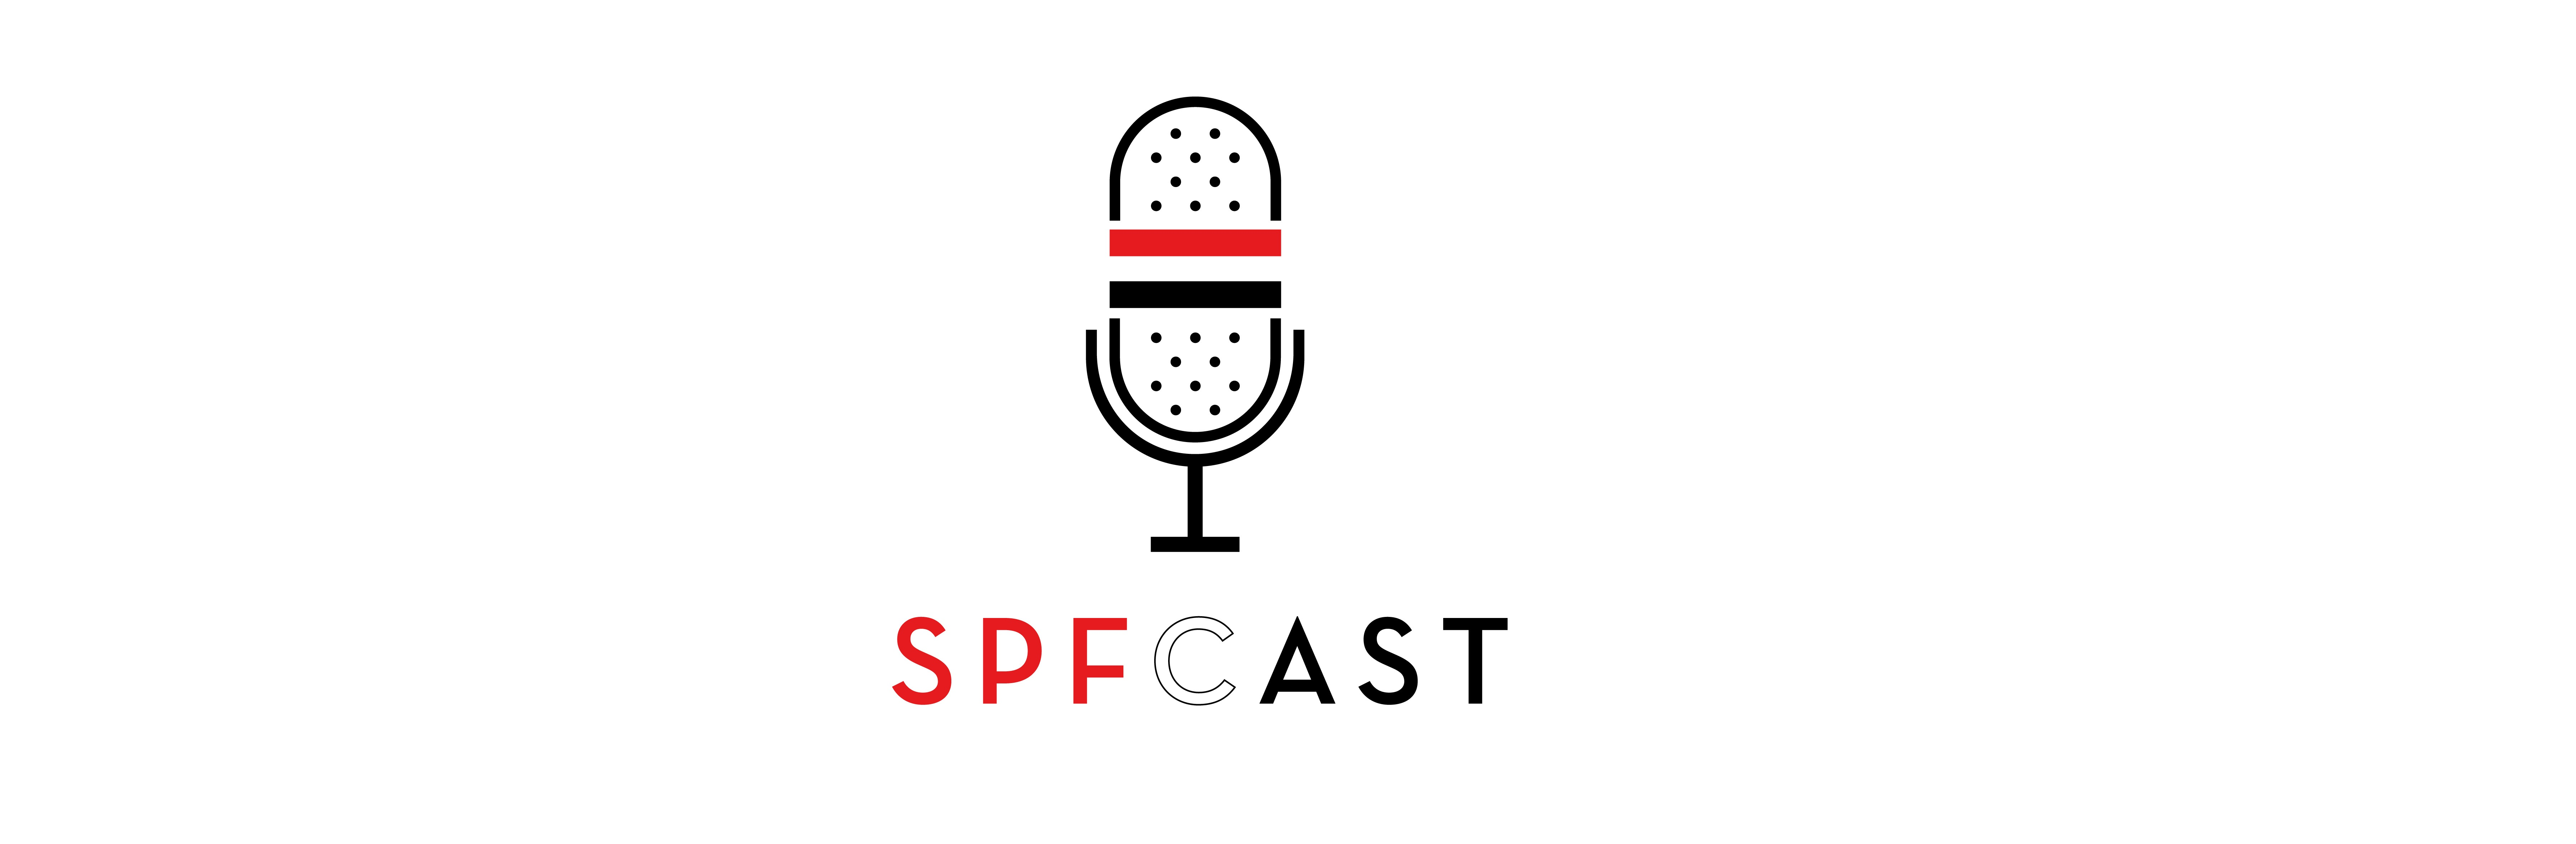 Spfcast logofinal 01